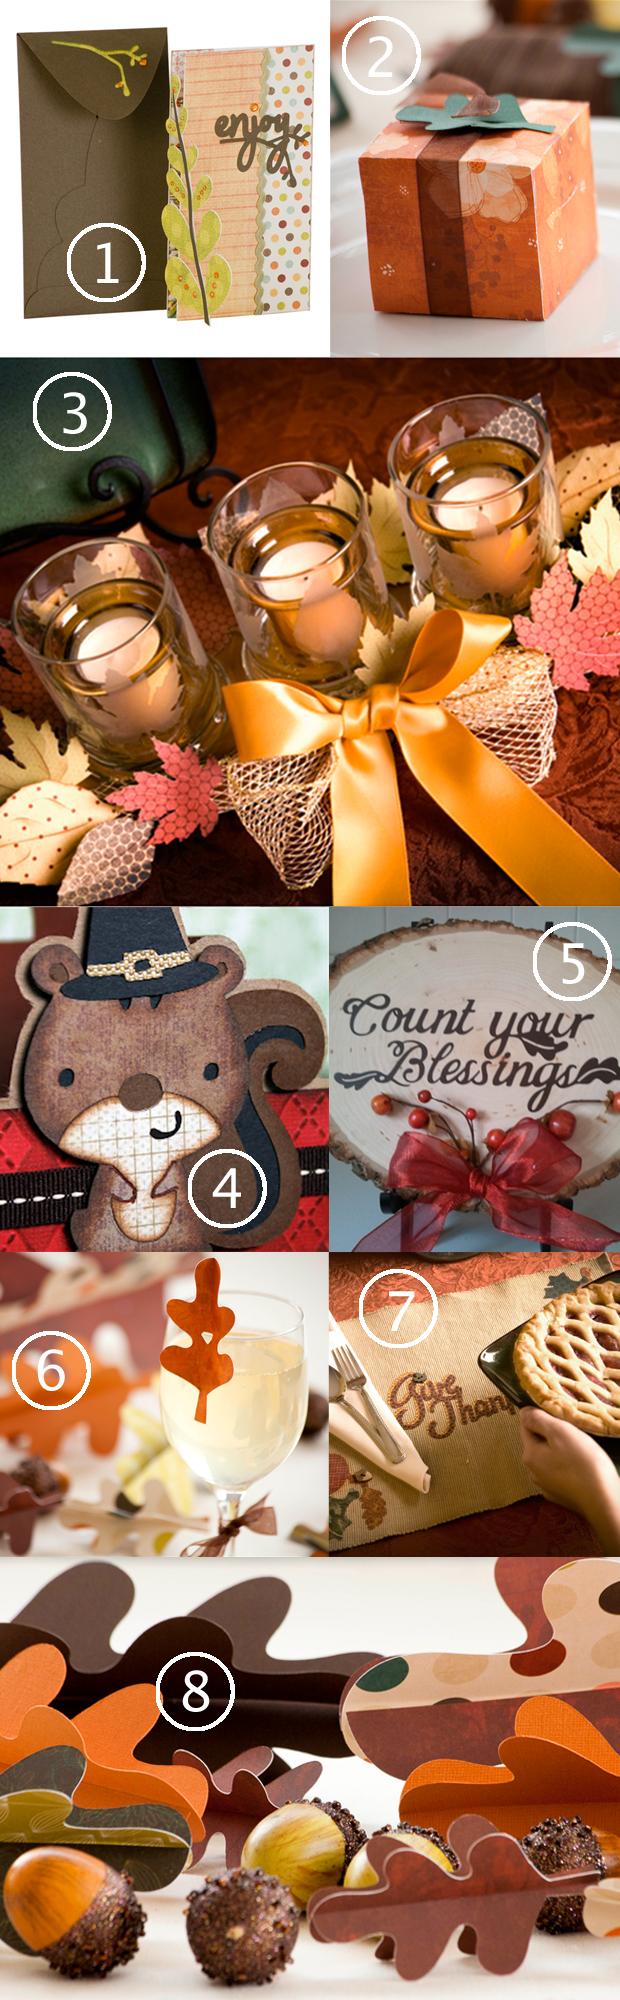 Top 8 Cricut Thanksgiving Projects & Cricut Mini Giveaway | HandsOccupied.com